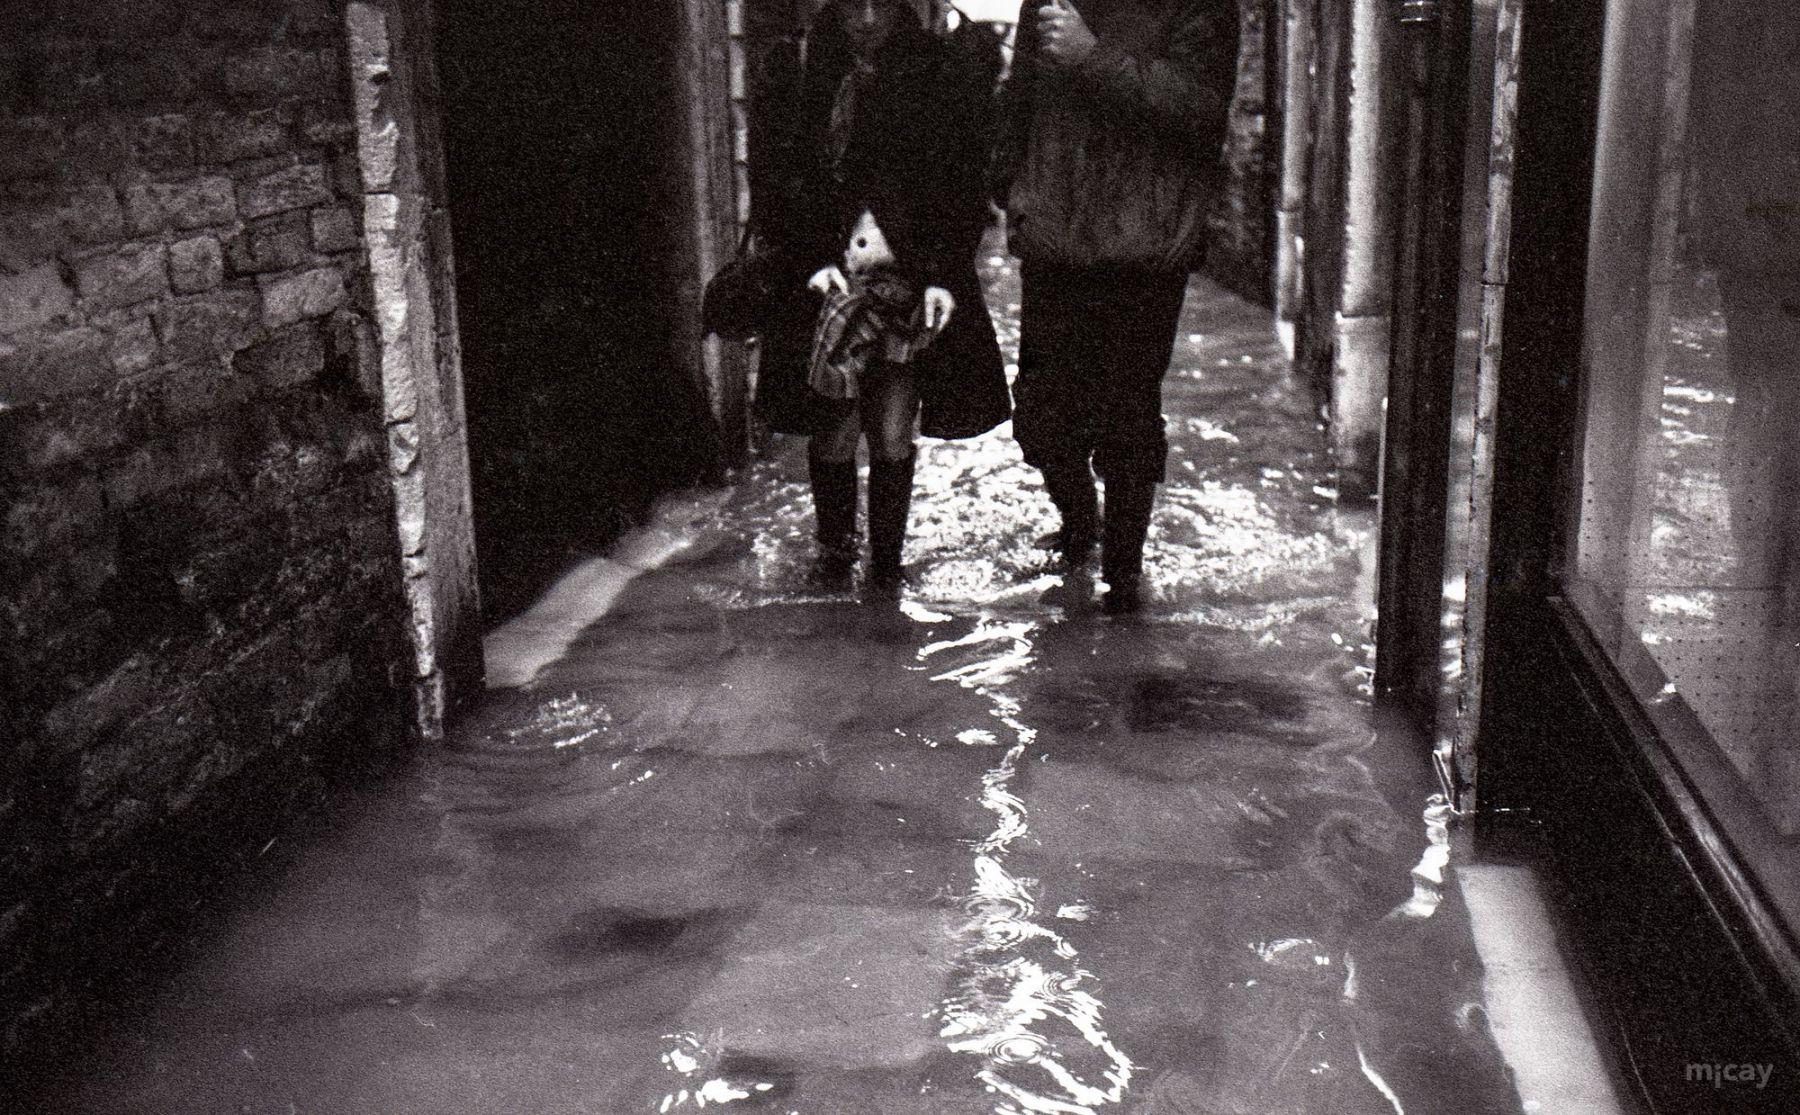 MichelAycaguer-Venise-AquaAlta-Noel-1981-15